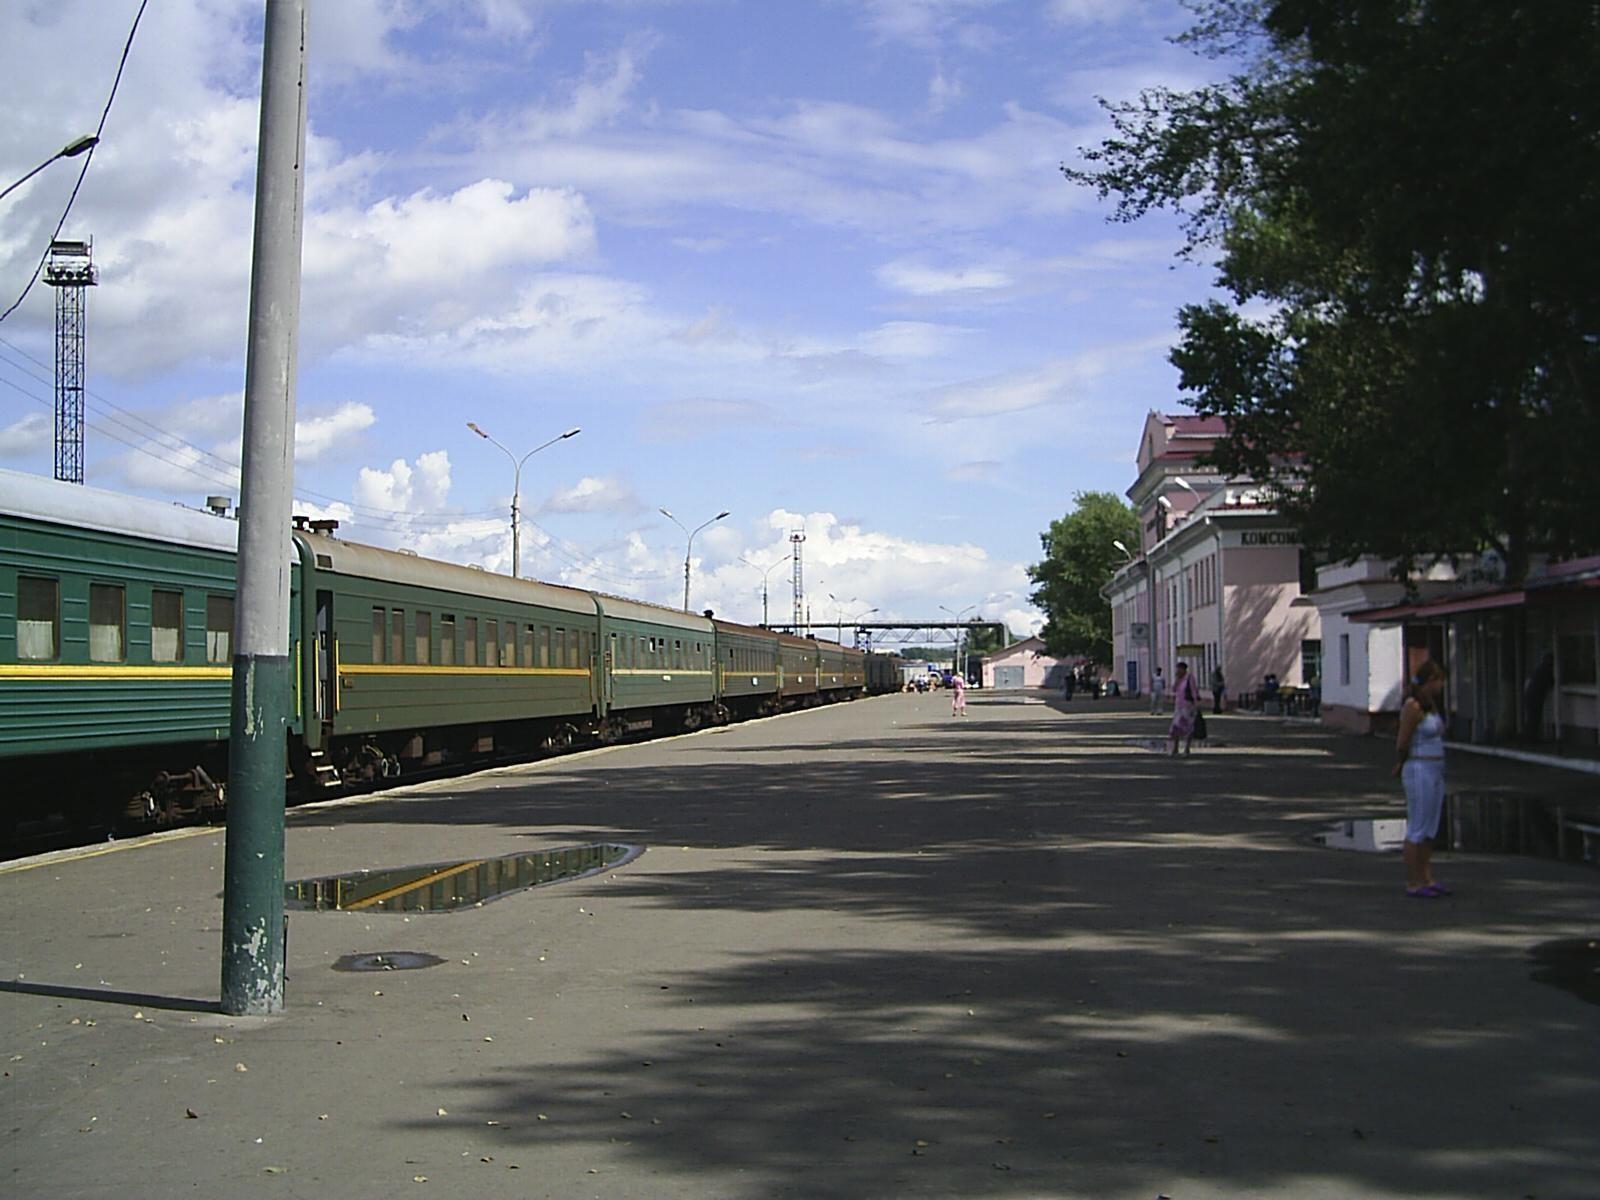 Na peronu v Komsomolsku na Amurju